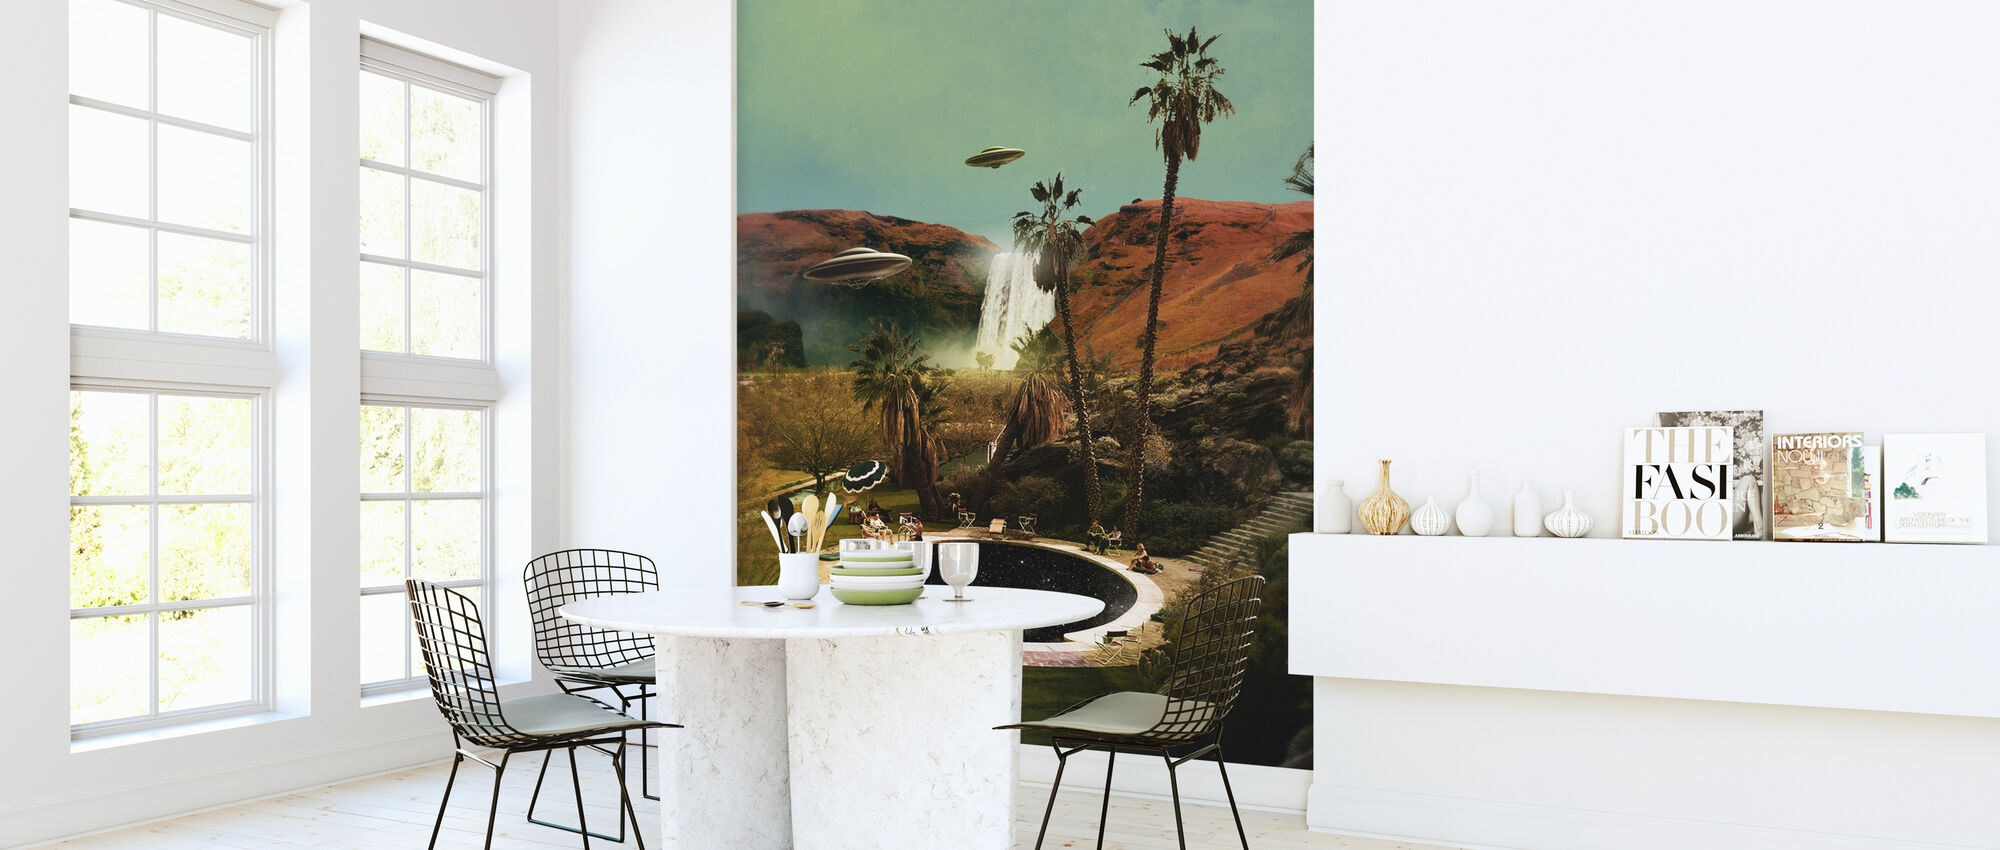 Guests - Wallpaper - Kitchen